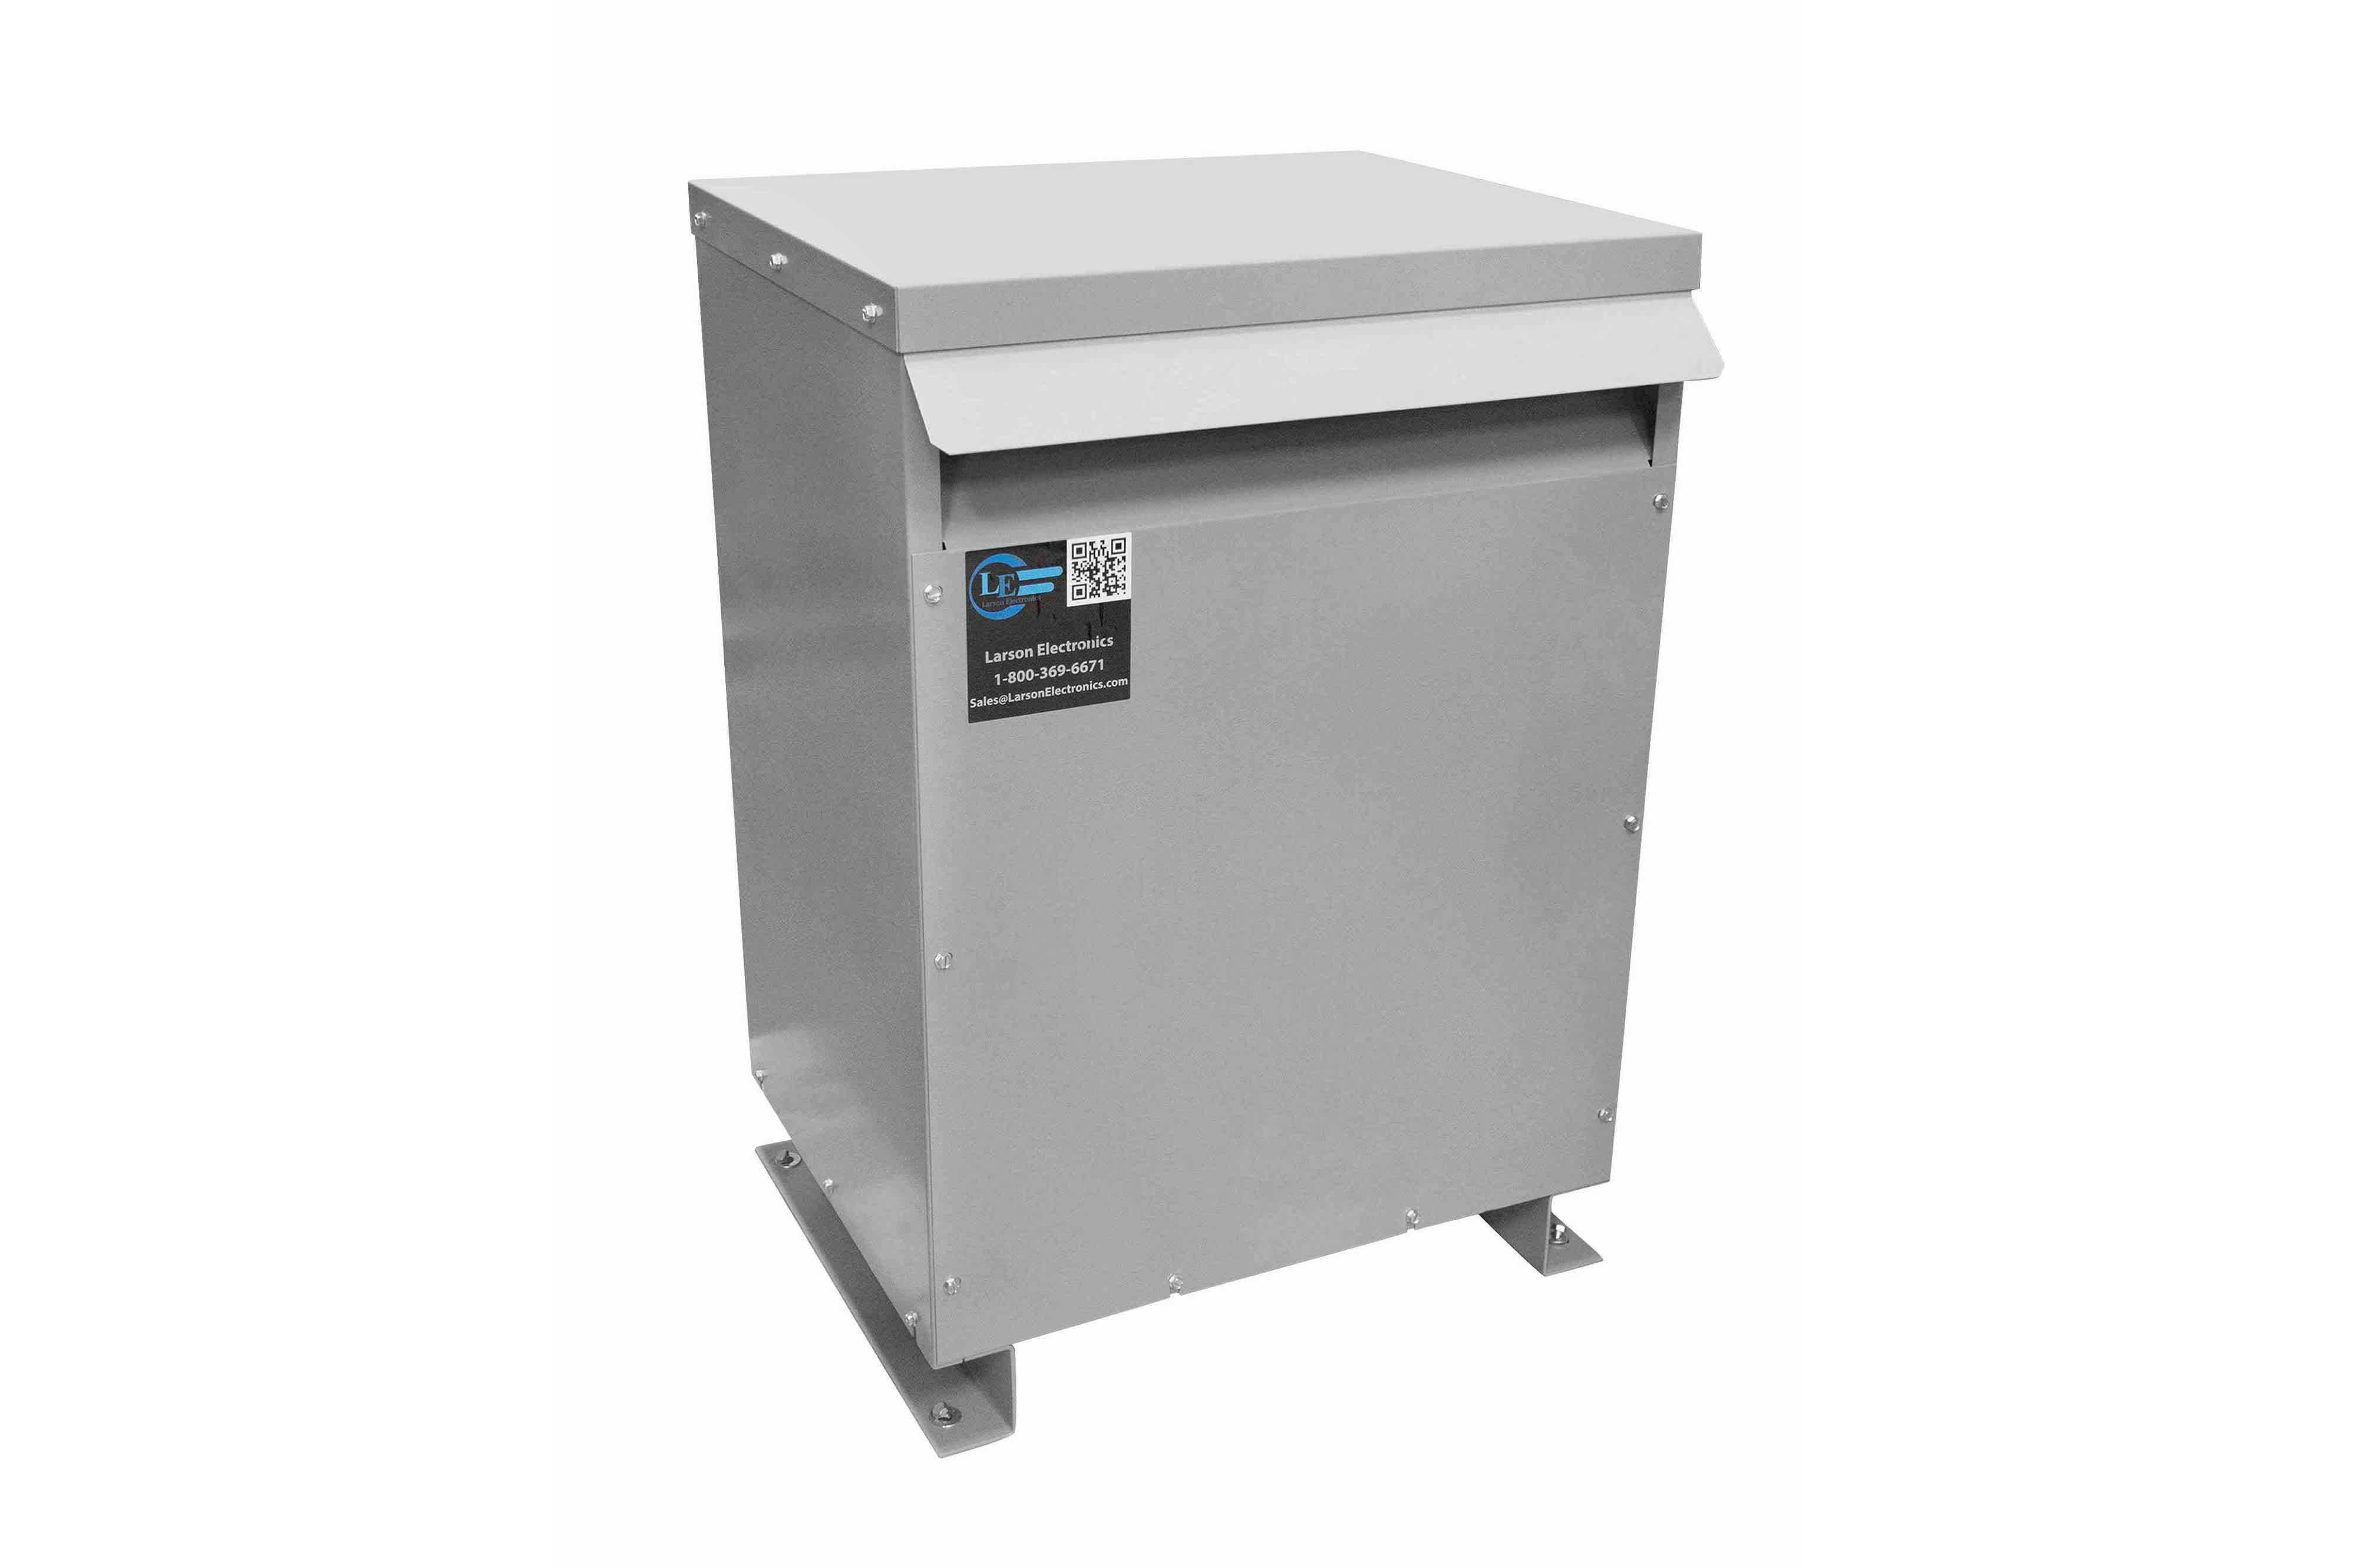 52.5 kVA 3PH Isolation Transformer, 575V Wye Primary, 380Y/220 Wye-N Secondary, N3R, Ventilated, 60 Hz